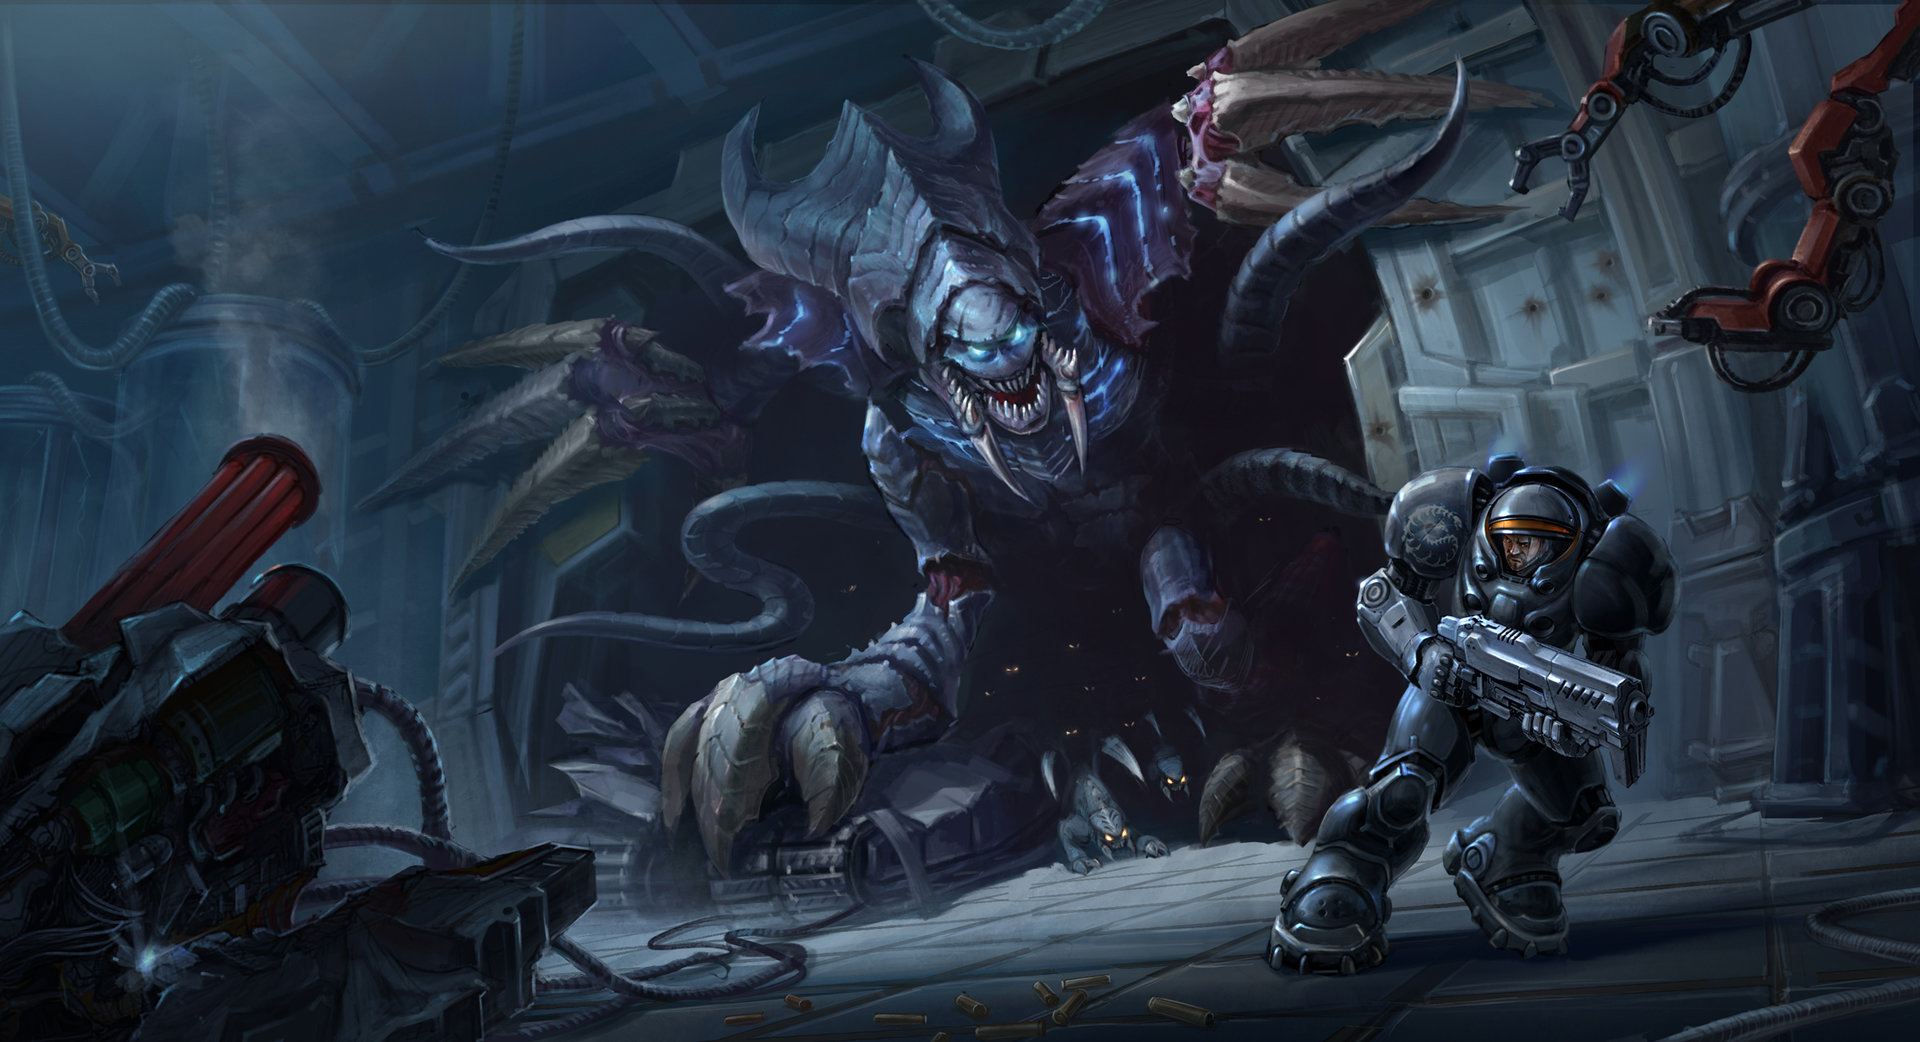 Heroes of the storm build concept amon heroesfire - Starcraft 2 wallpaper art ...